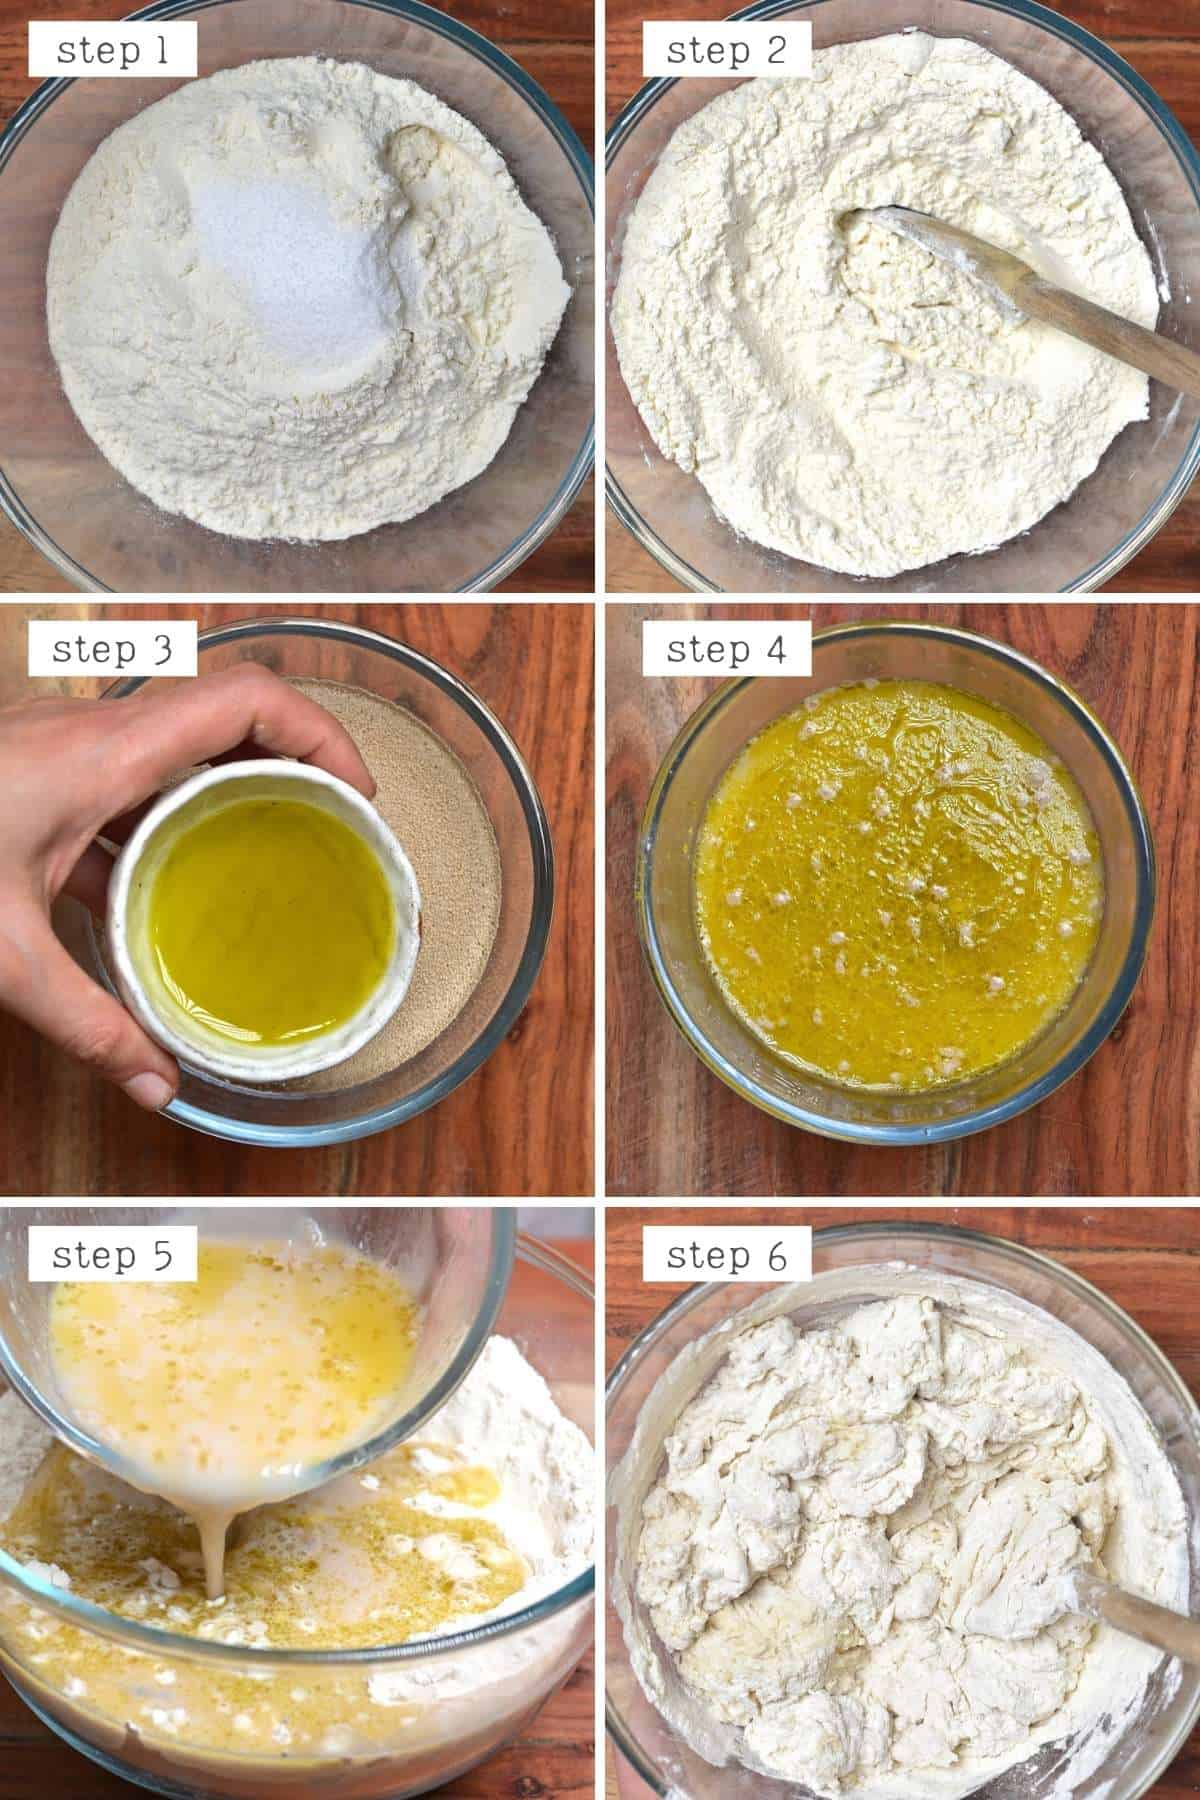 Steps for making pretzel dough